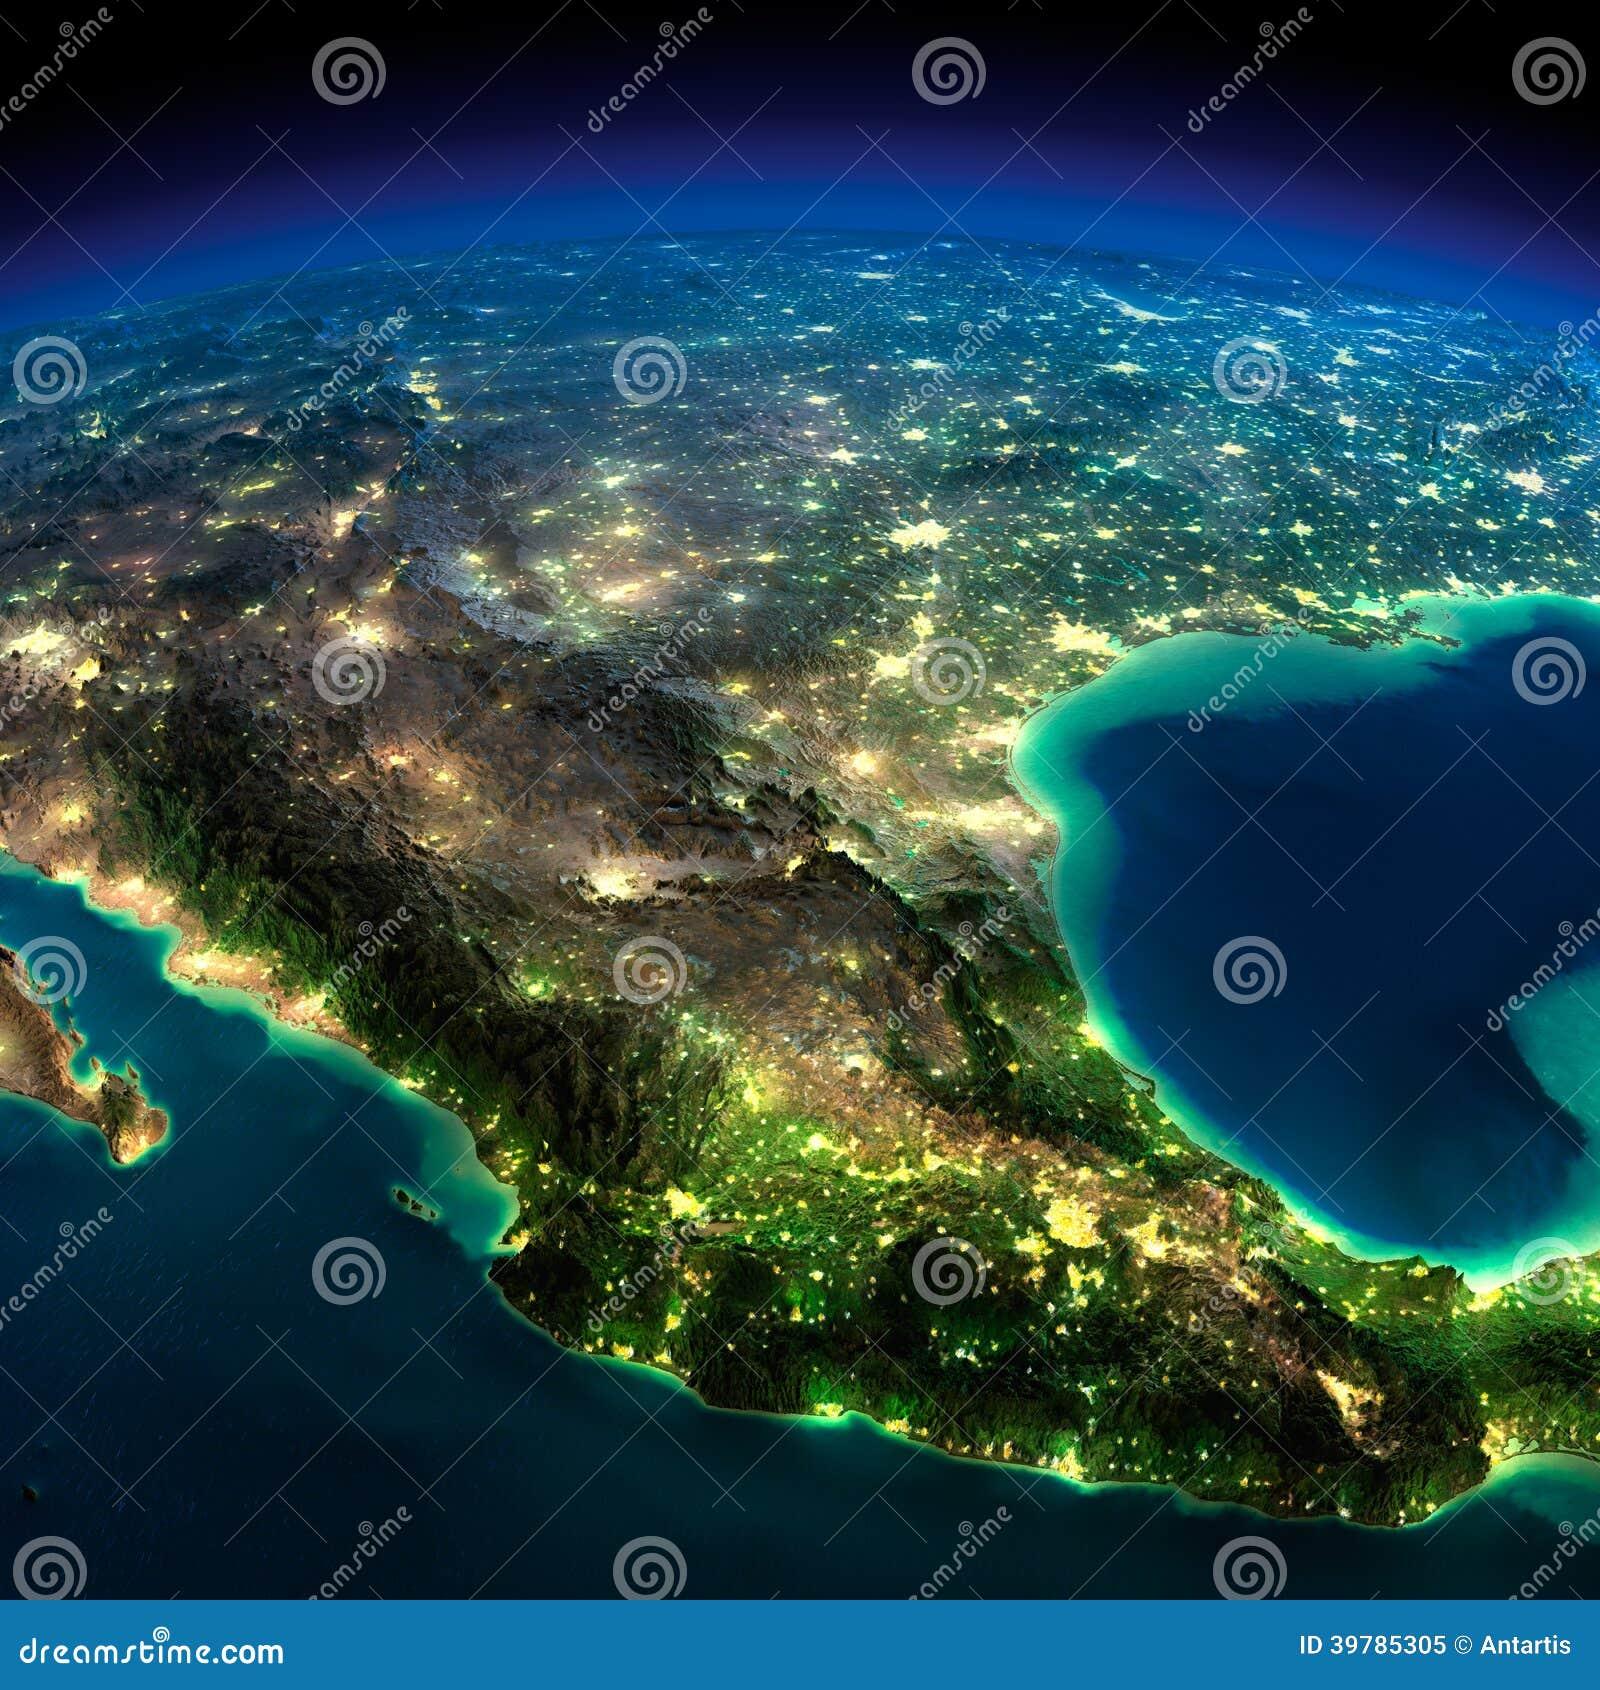 night light footprint north america nasa - photo #33